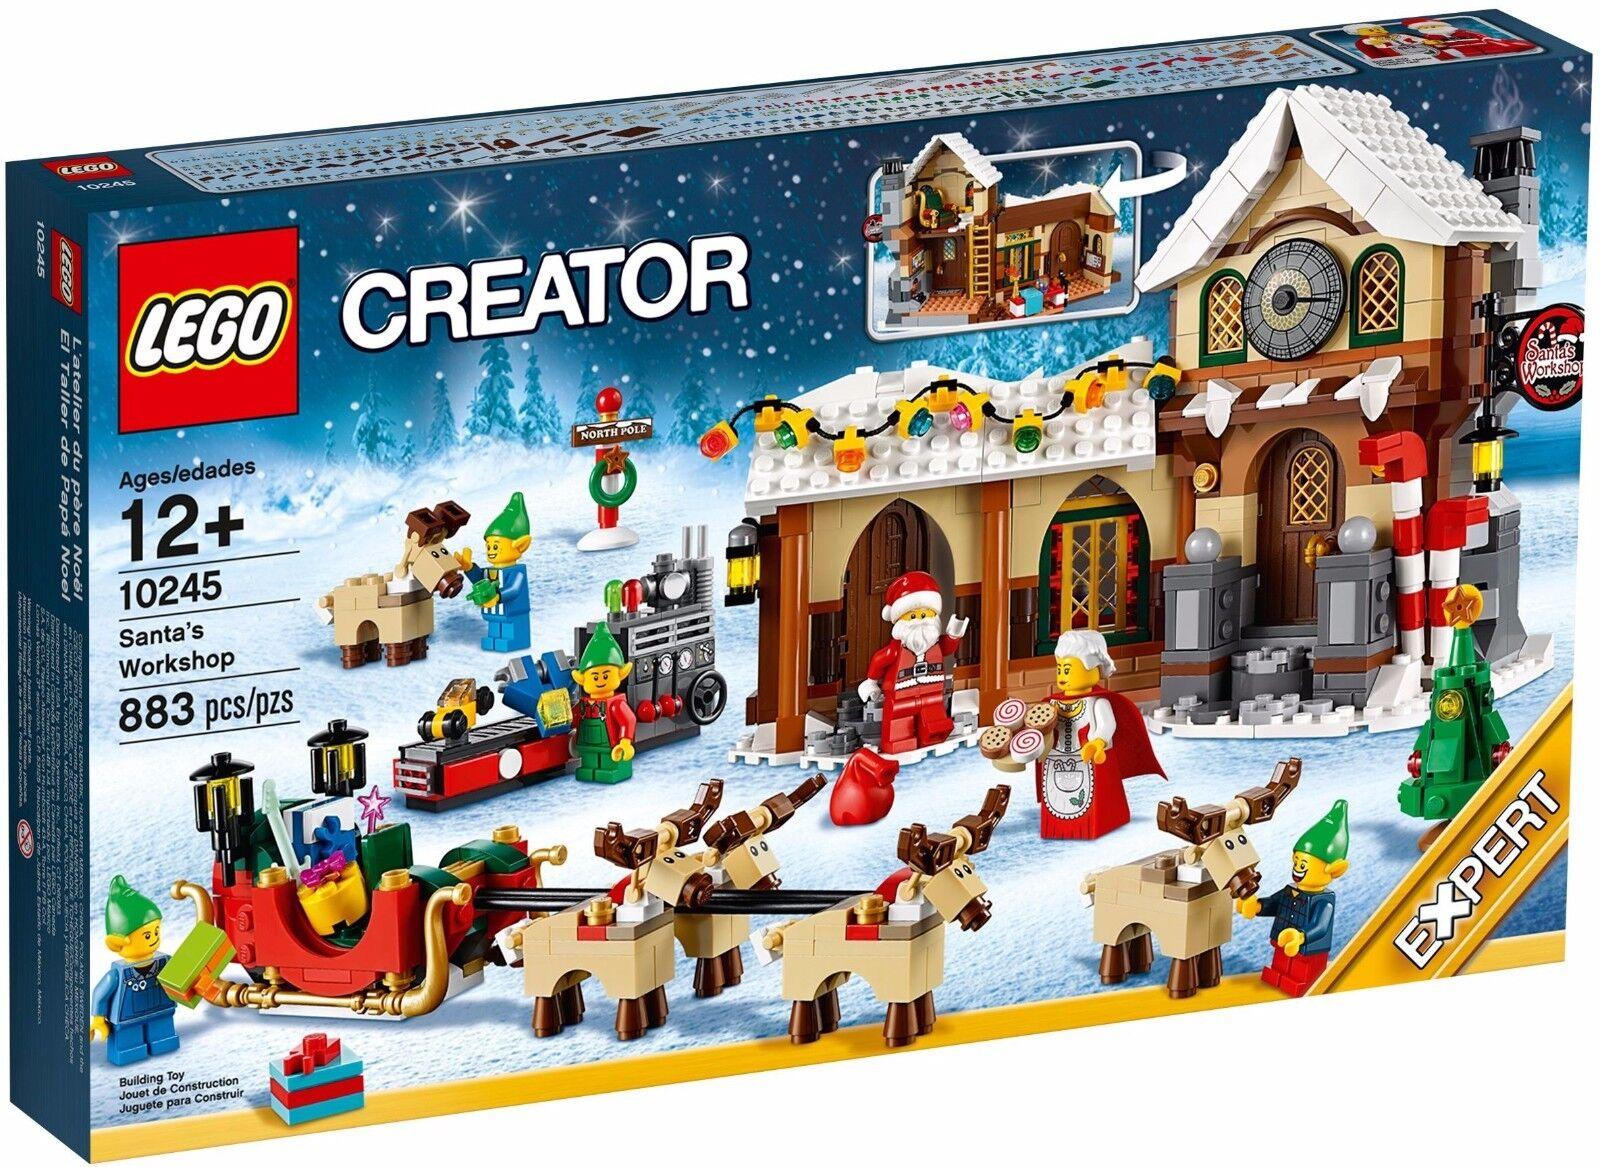 LEGO Creator - Santa's Workshop 10245 RetiROT - NEW/Sealed - Christmas Holiday